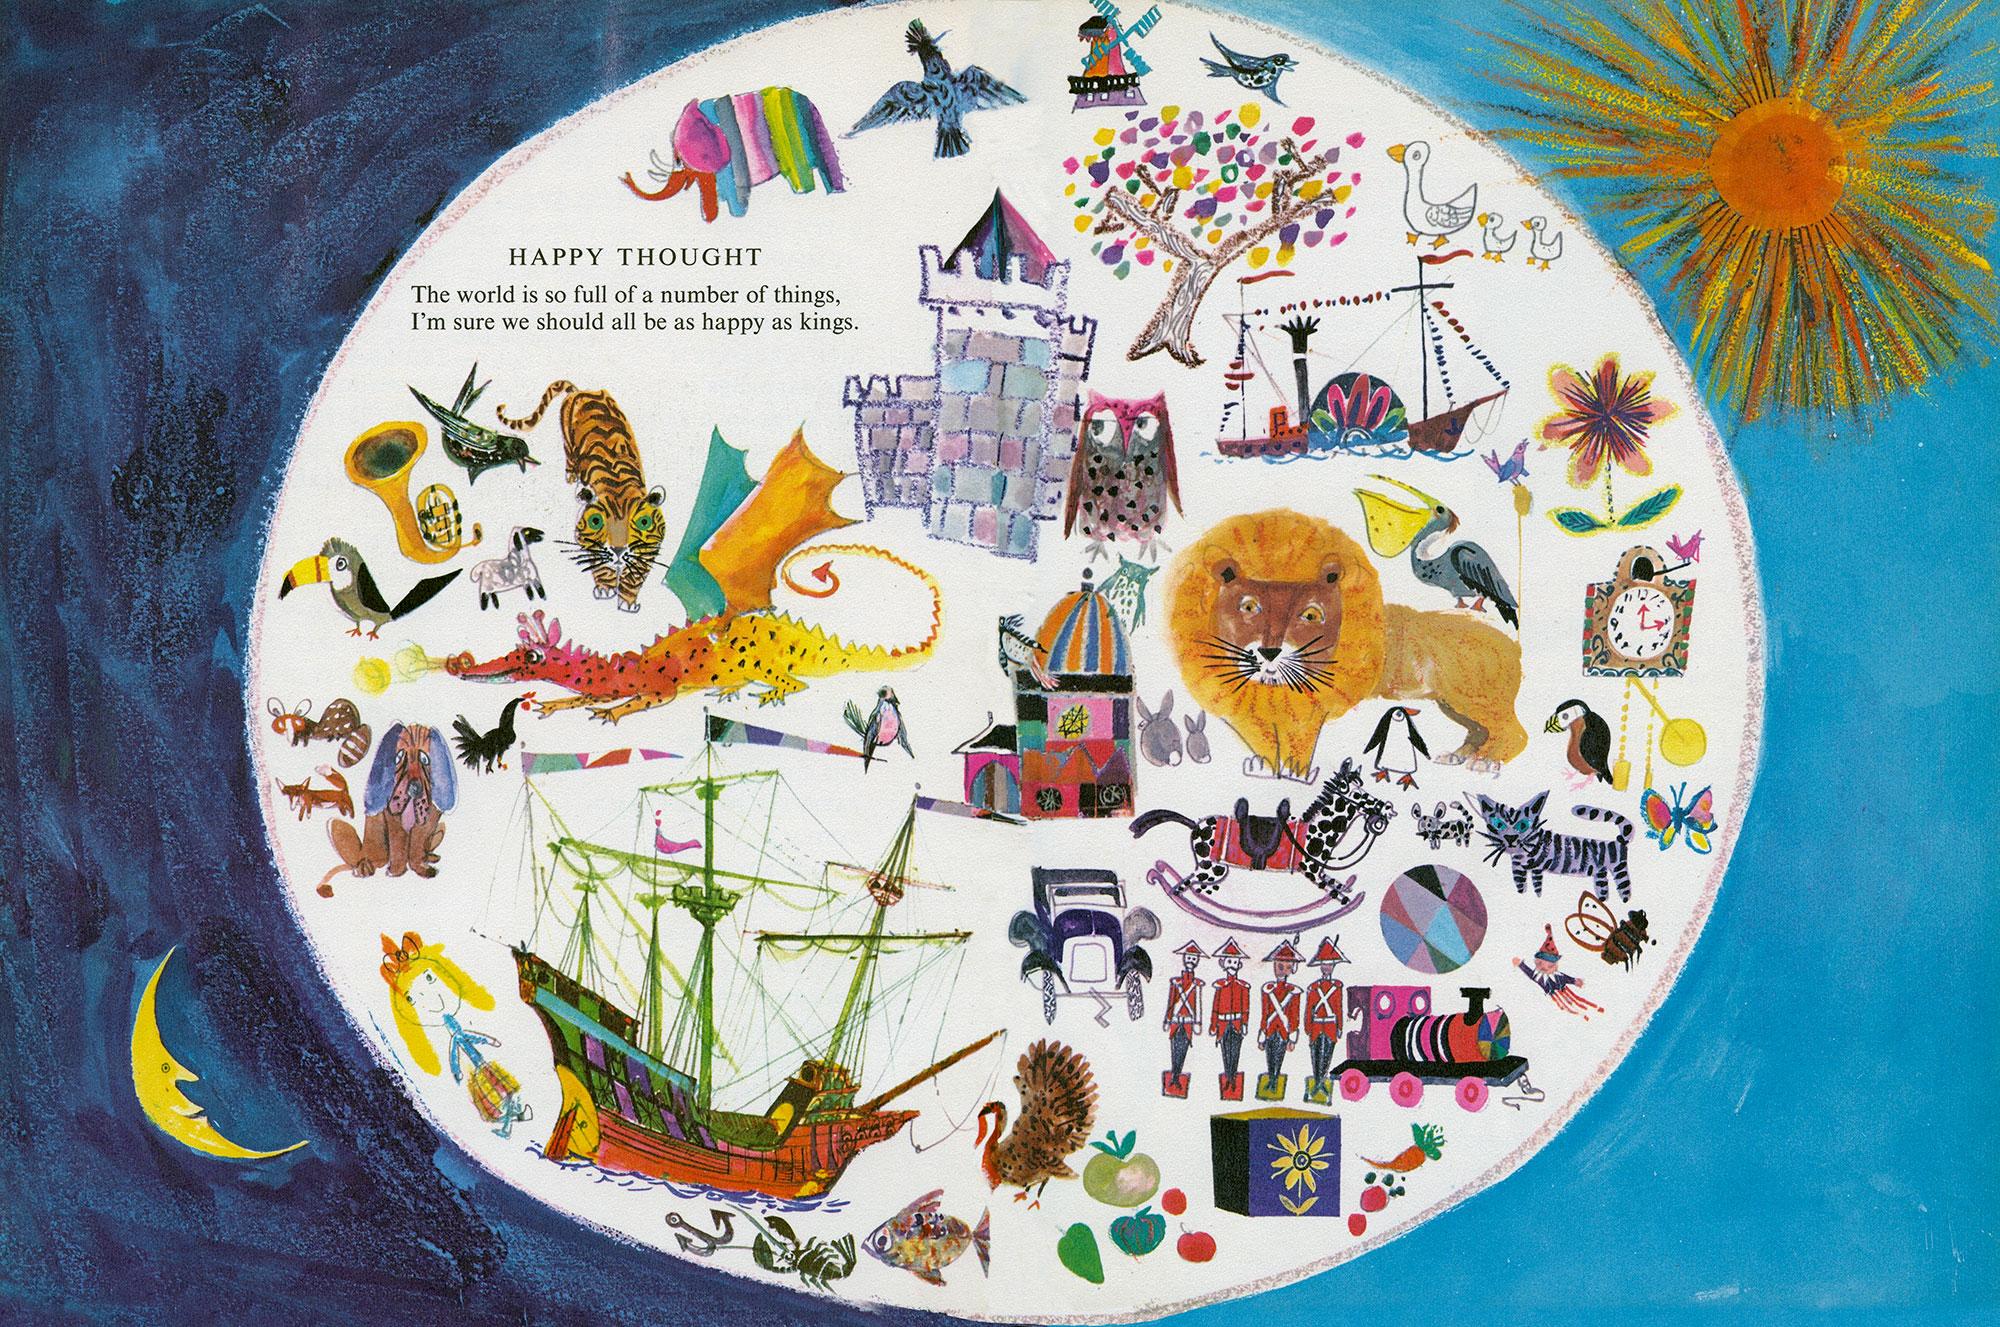 Robert-Louis-Stevenson-a-childs-garden-of-verses-Happy-Thought-Brian-Wildsmith.jpg